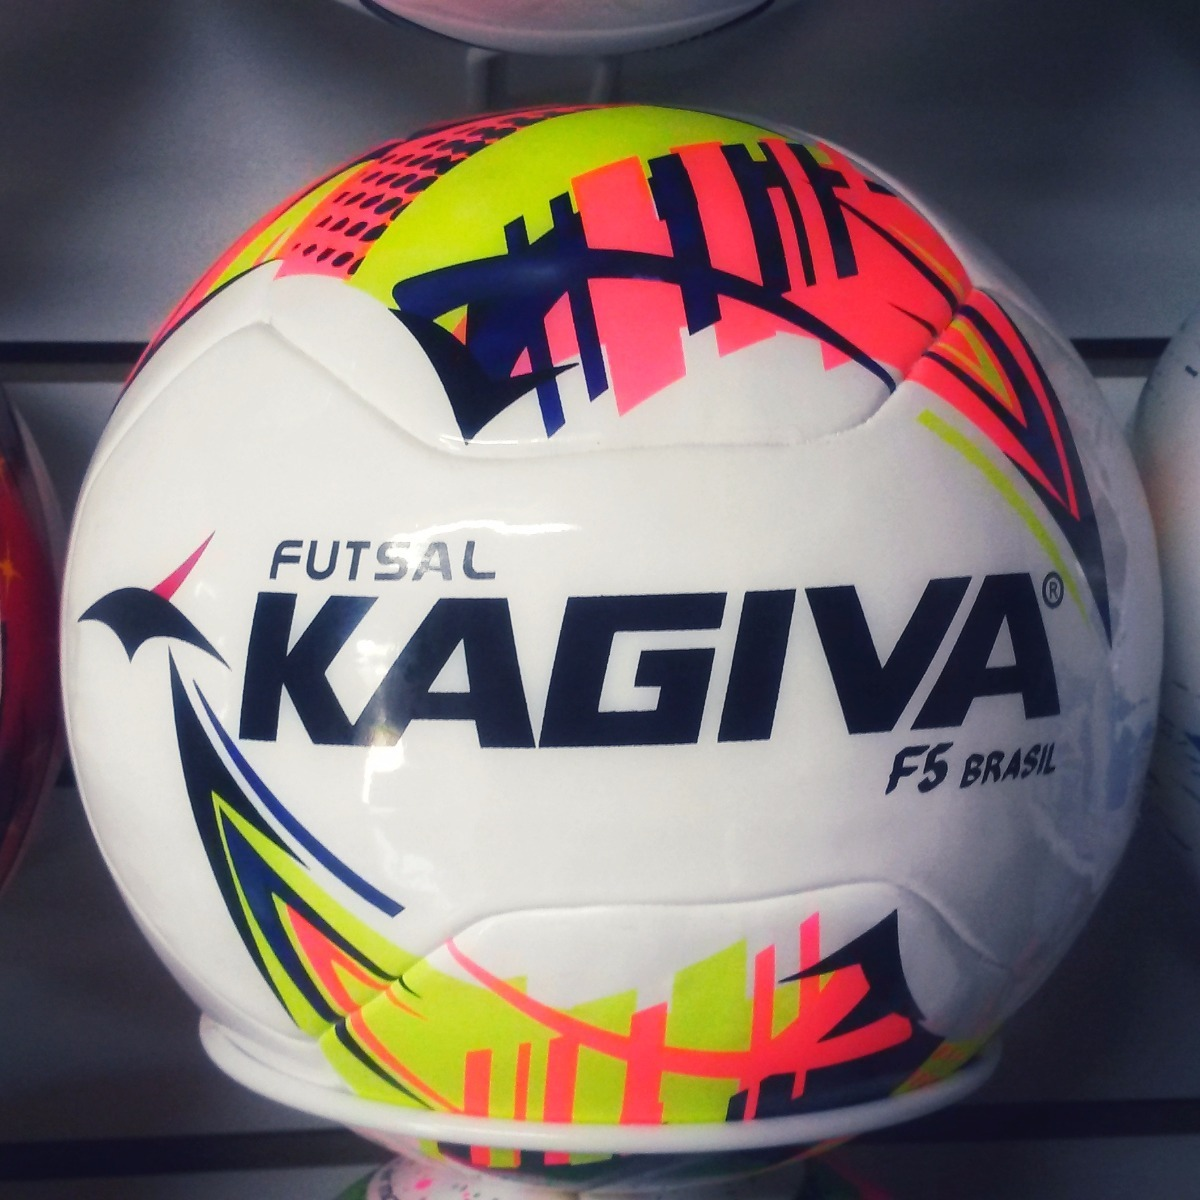 3285dead9a596 bola de futsal kagiva f5 brasil pro. Carregando zoom.